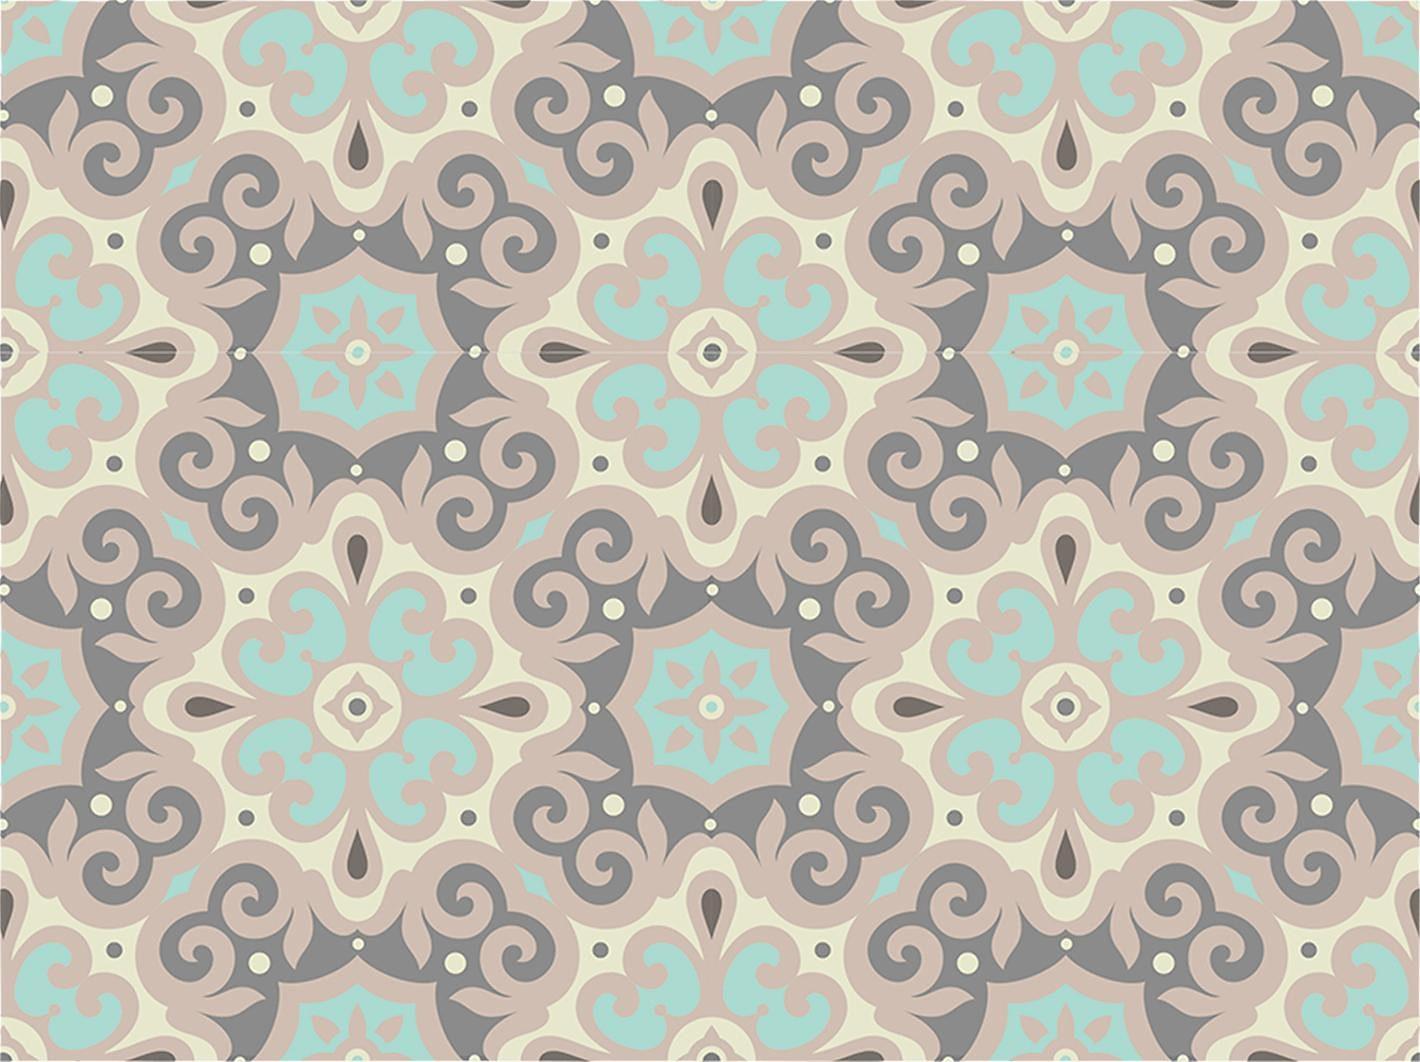 Home affaire Fliesenaufkleber »Ornamente«, 12x 15/15 cm, in harmonischer Farbkombination